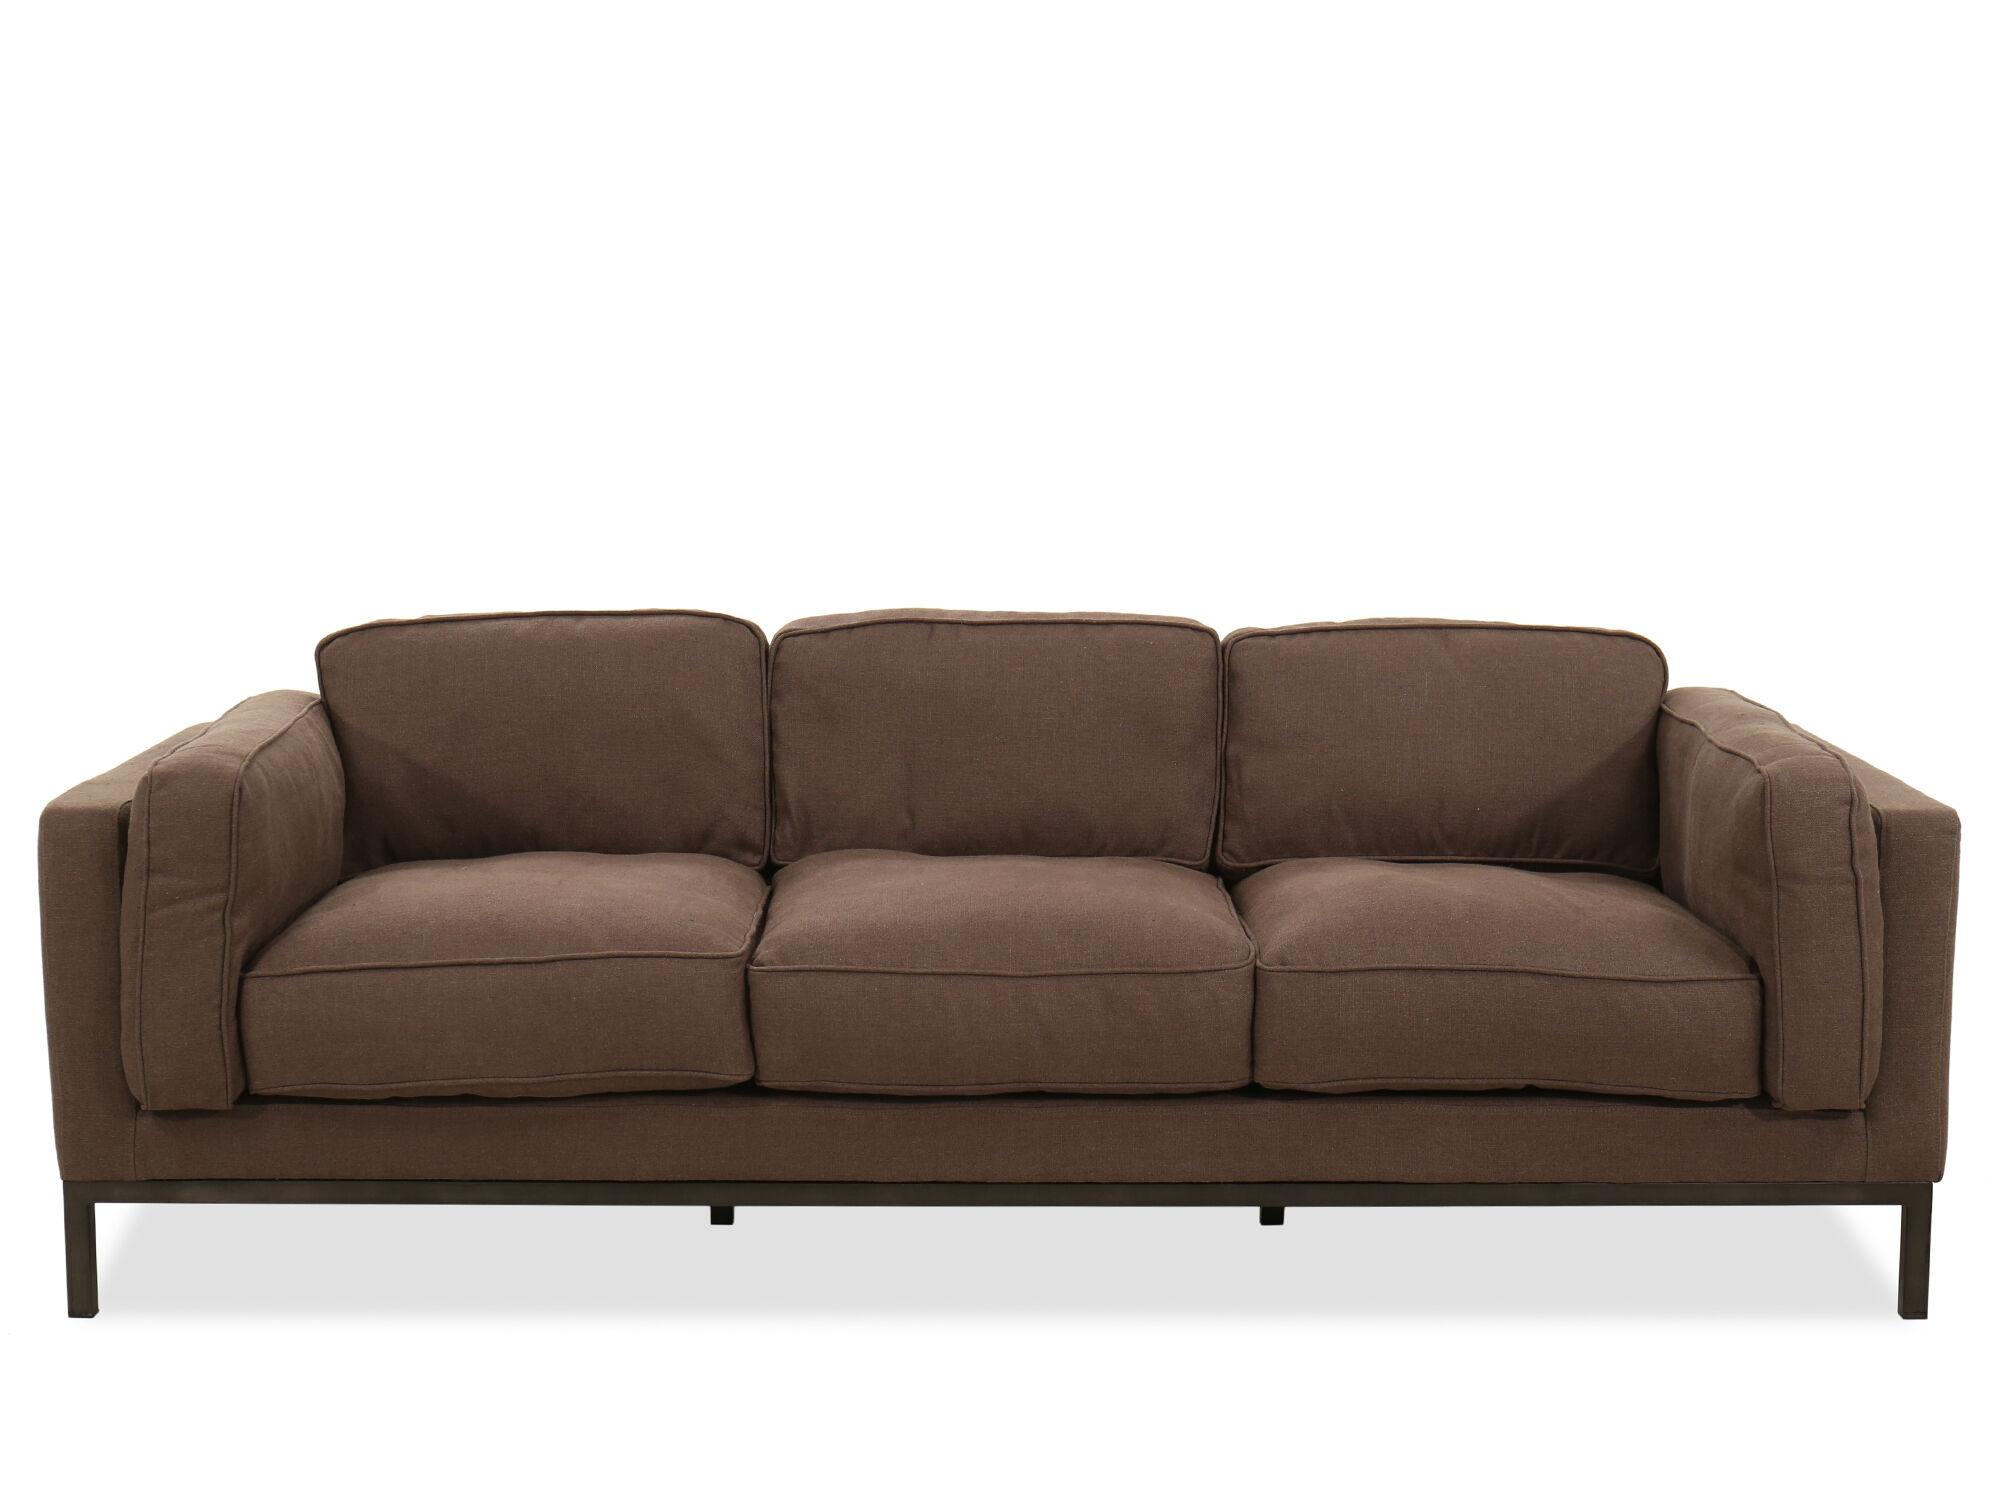 Low Profile Three Seater Sofa In Brown ...